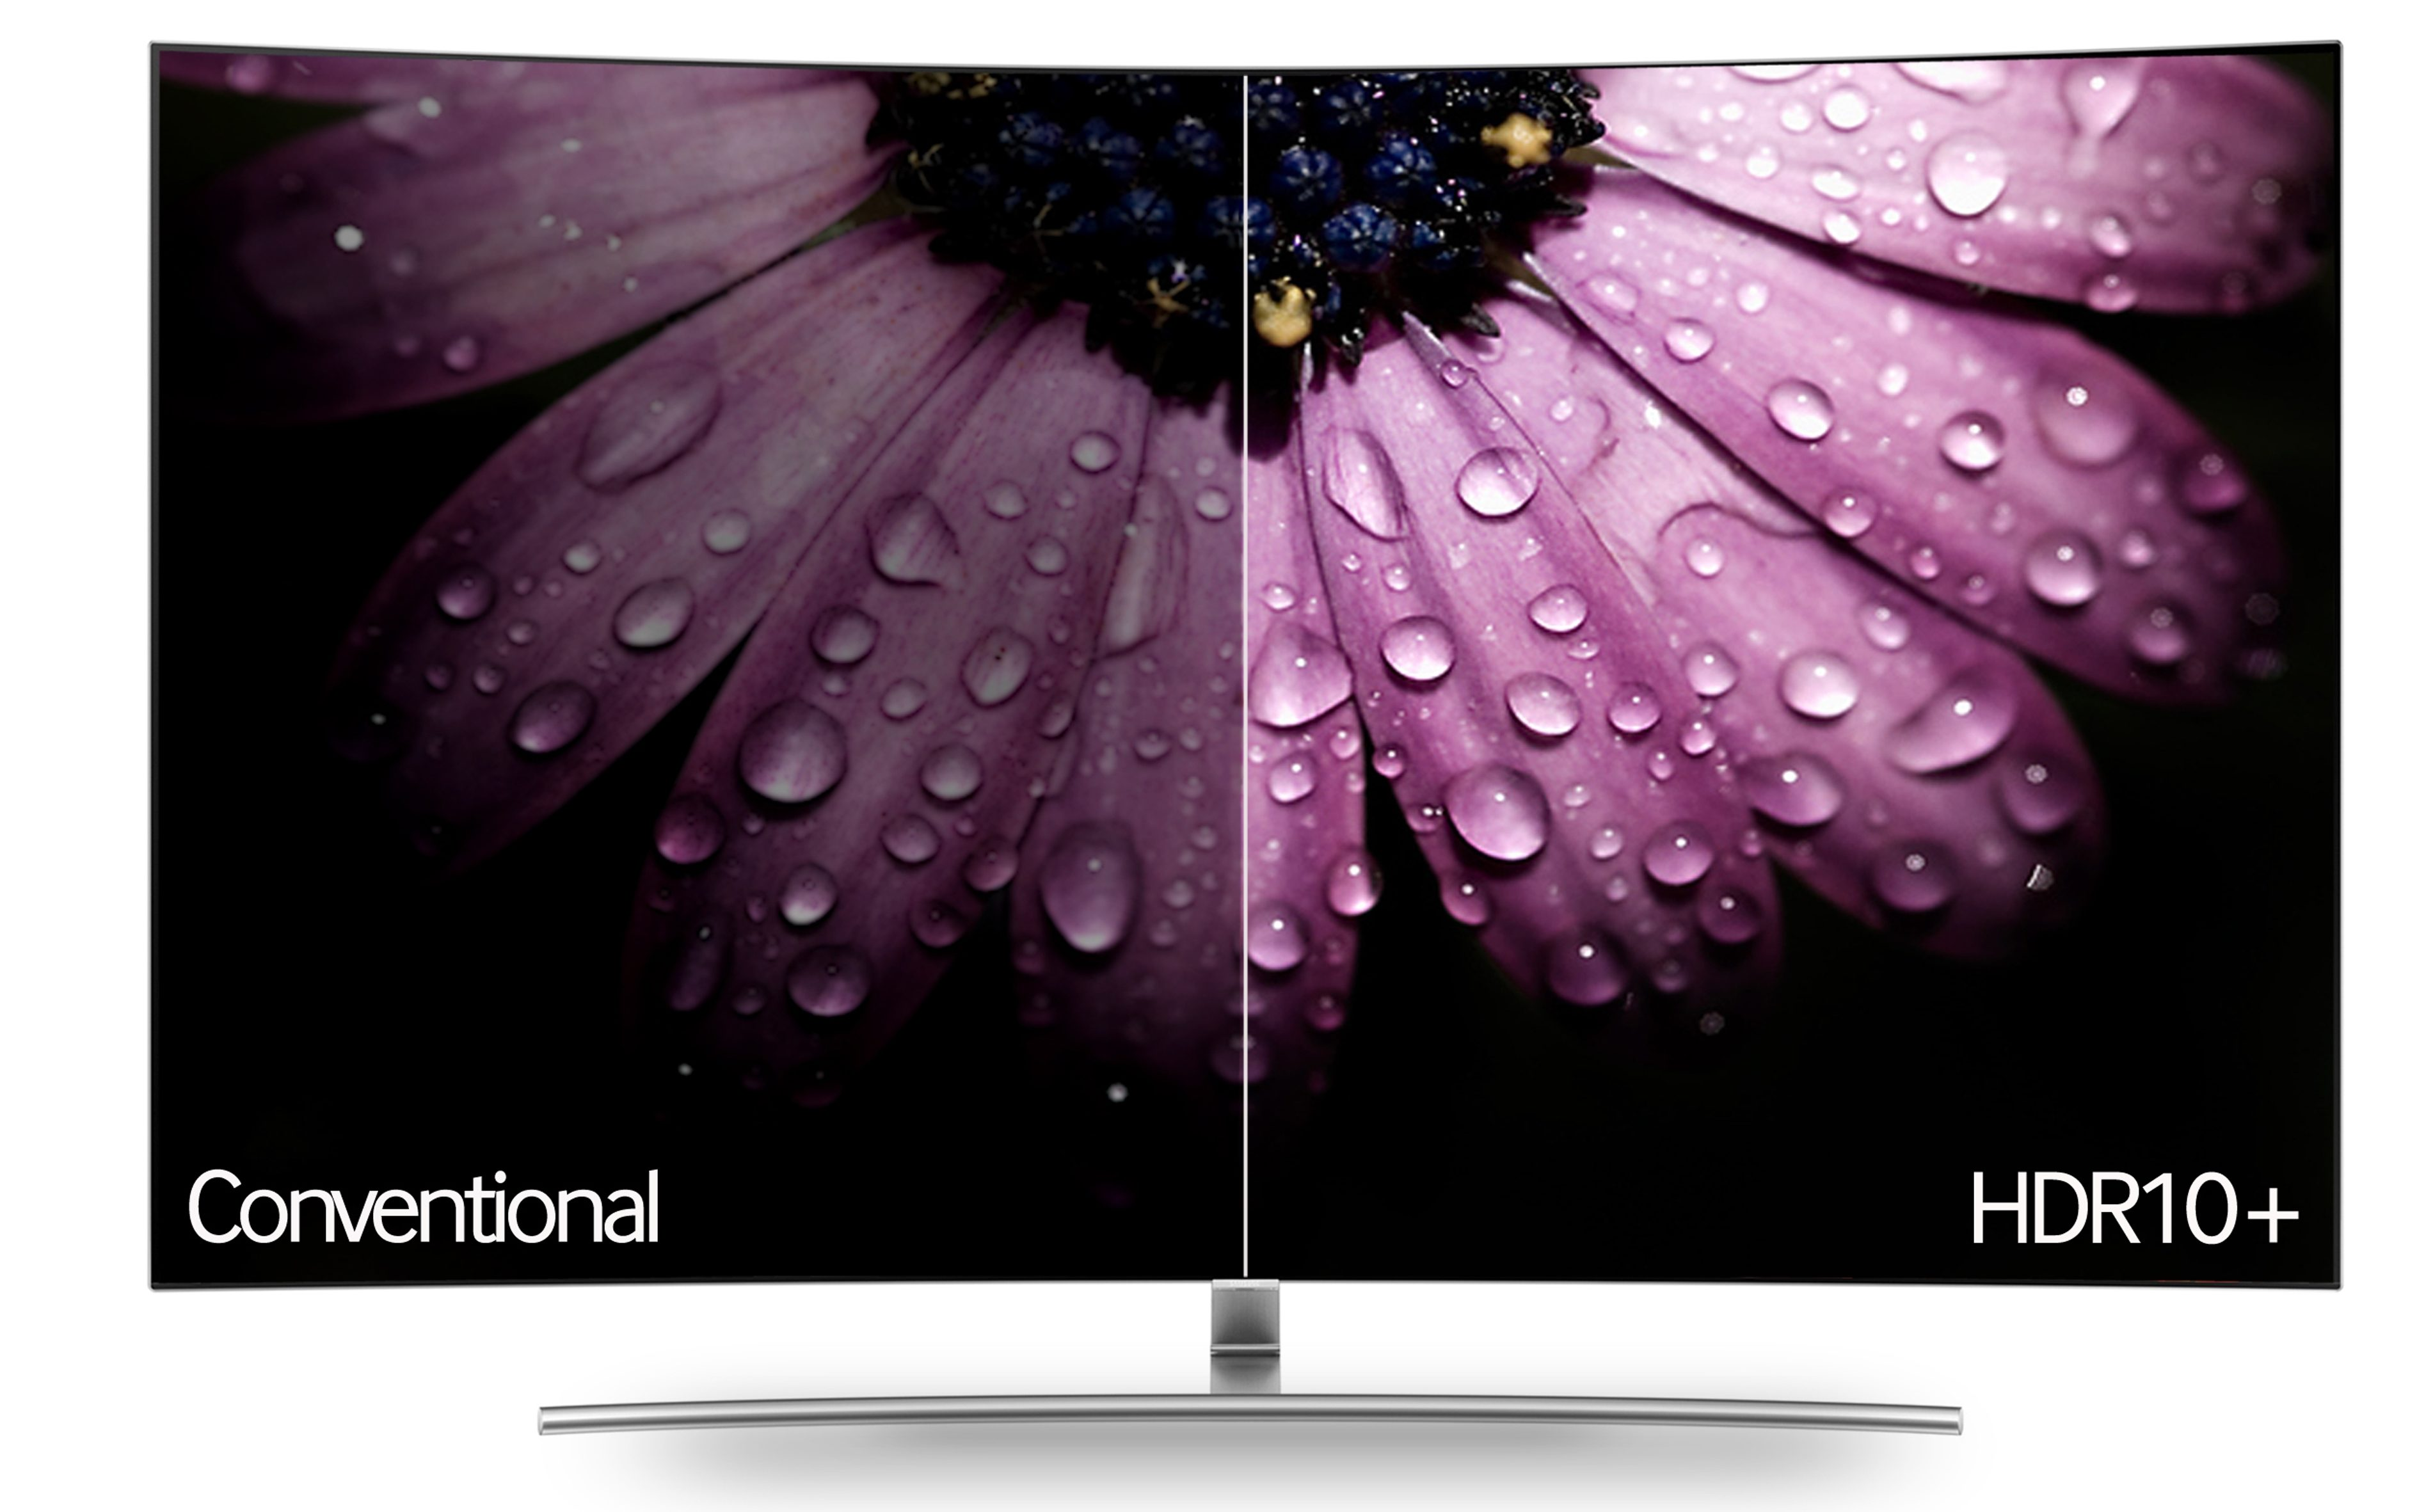 Kooperation zu HDR10+: Samsung Amazon Conventional HDR10plus